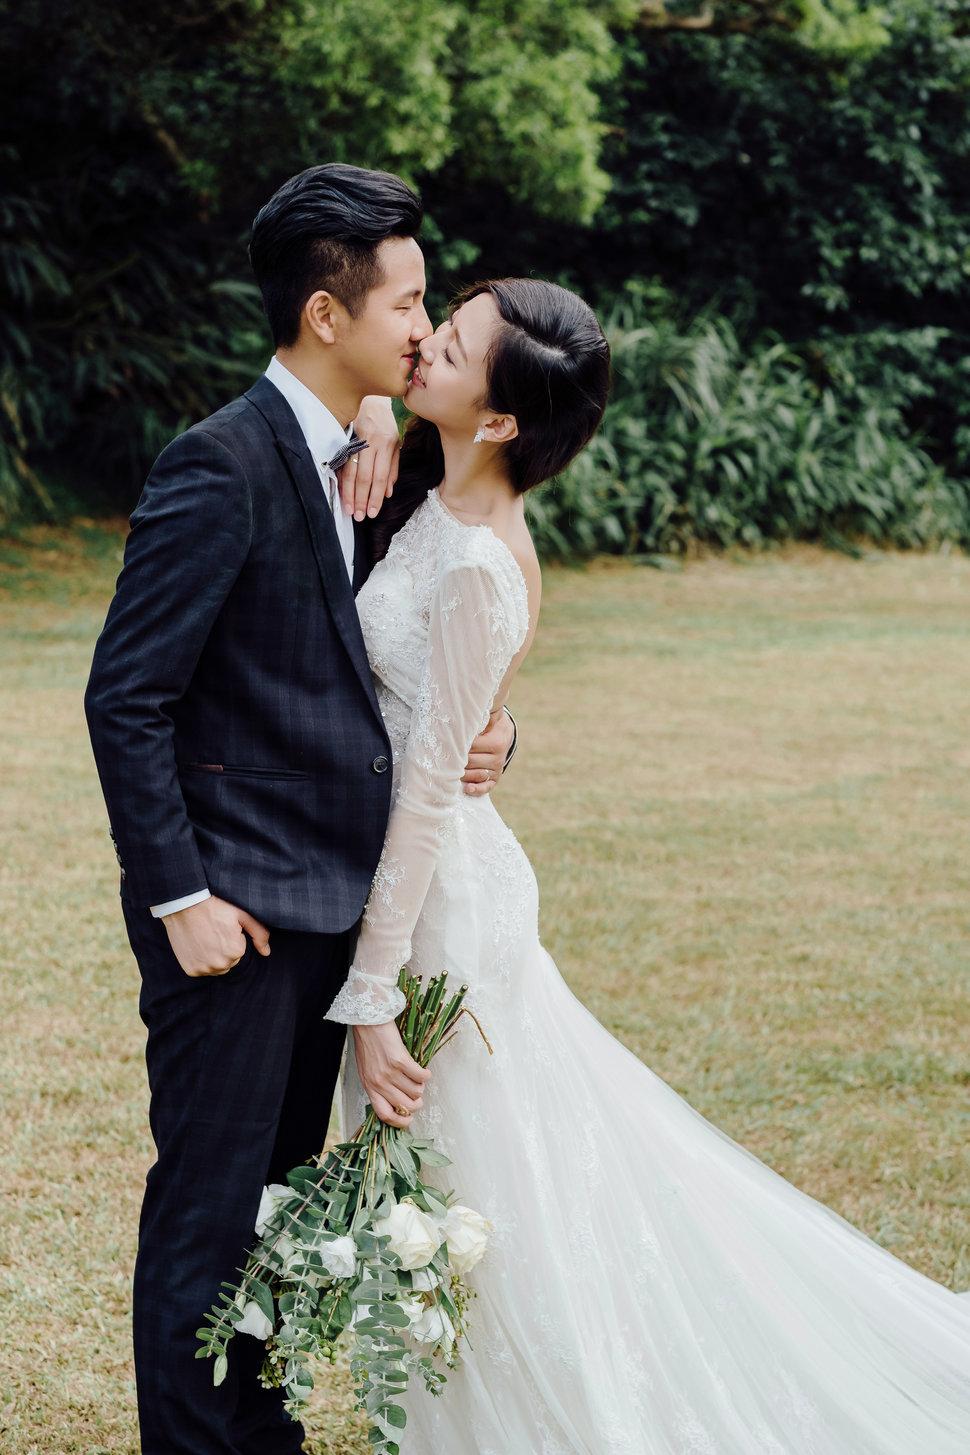 2017-07-22-16h42m32-DSCF5619 - Vicky Li 新娘秘書《結婚吧》